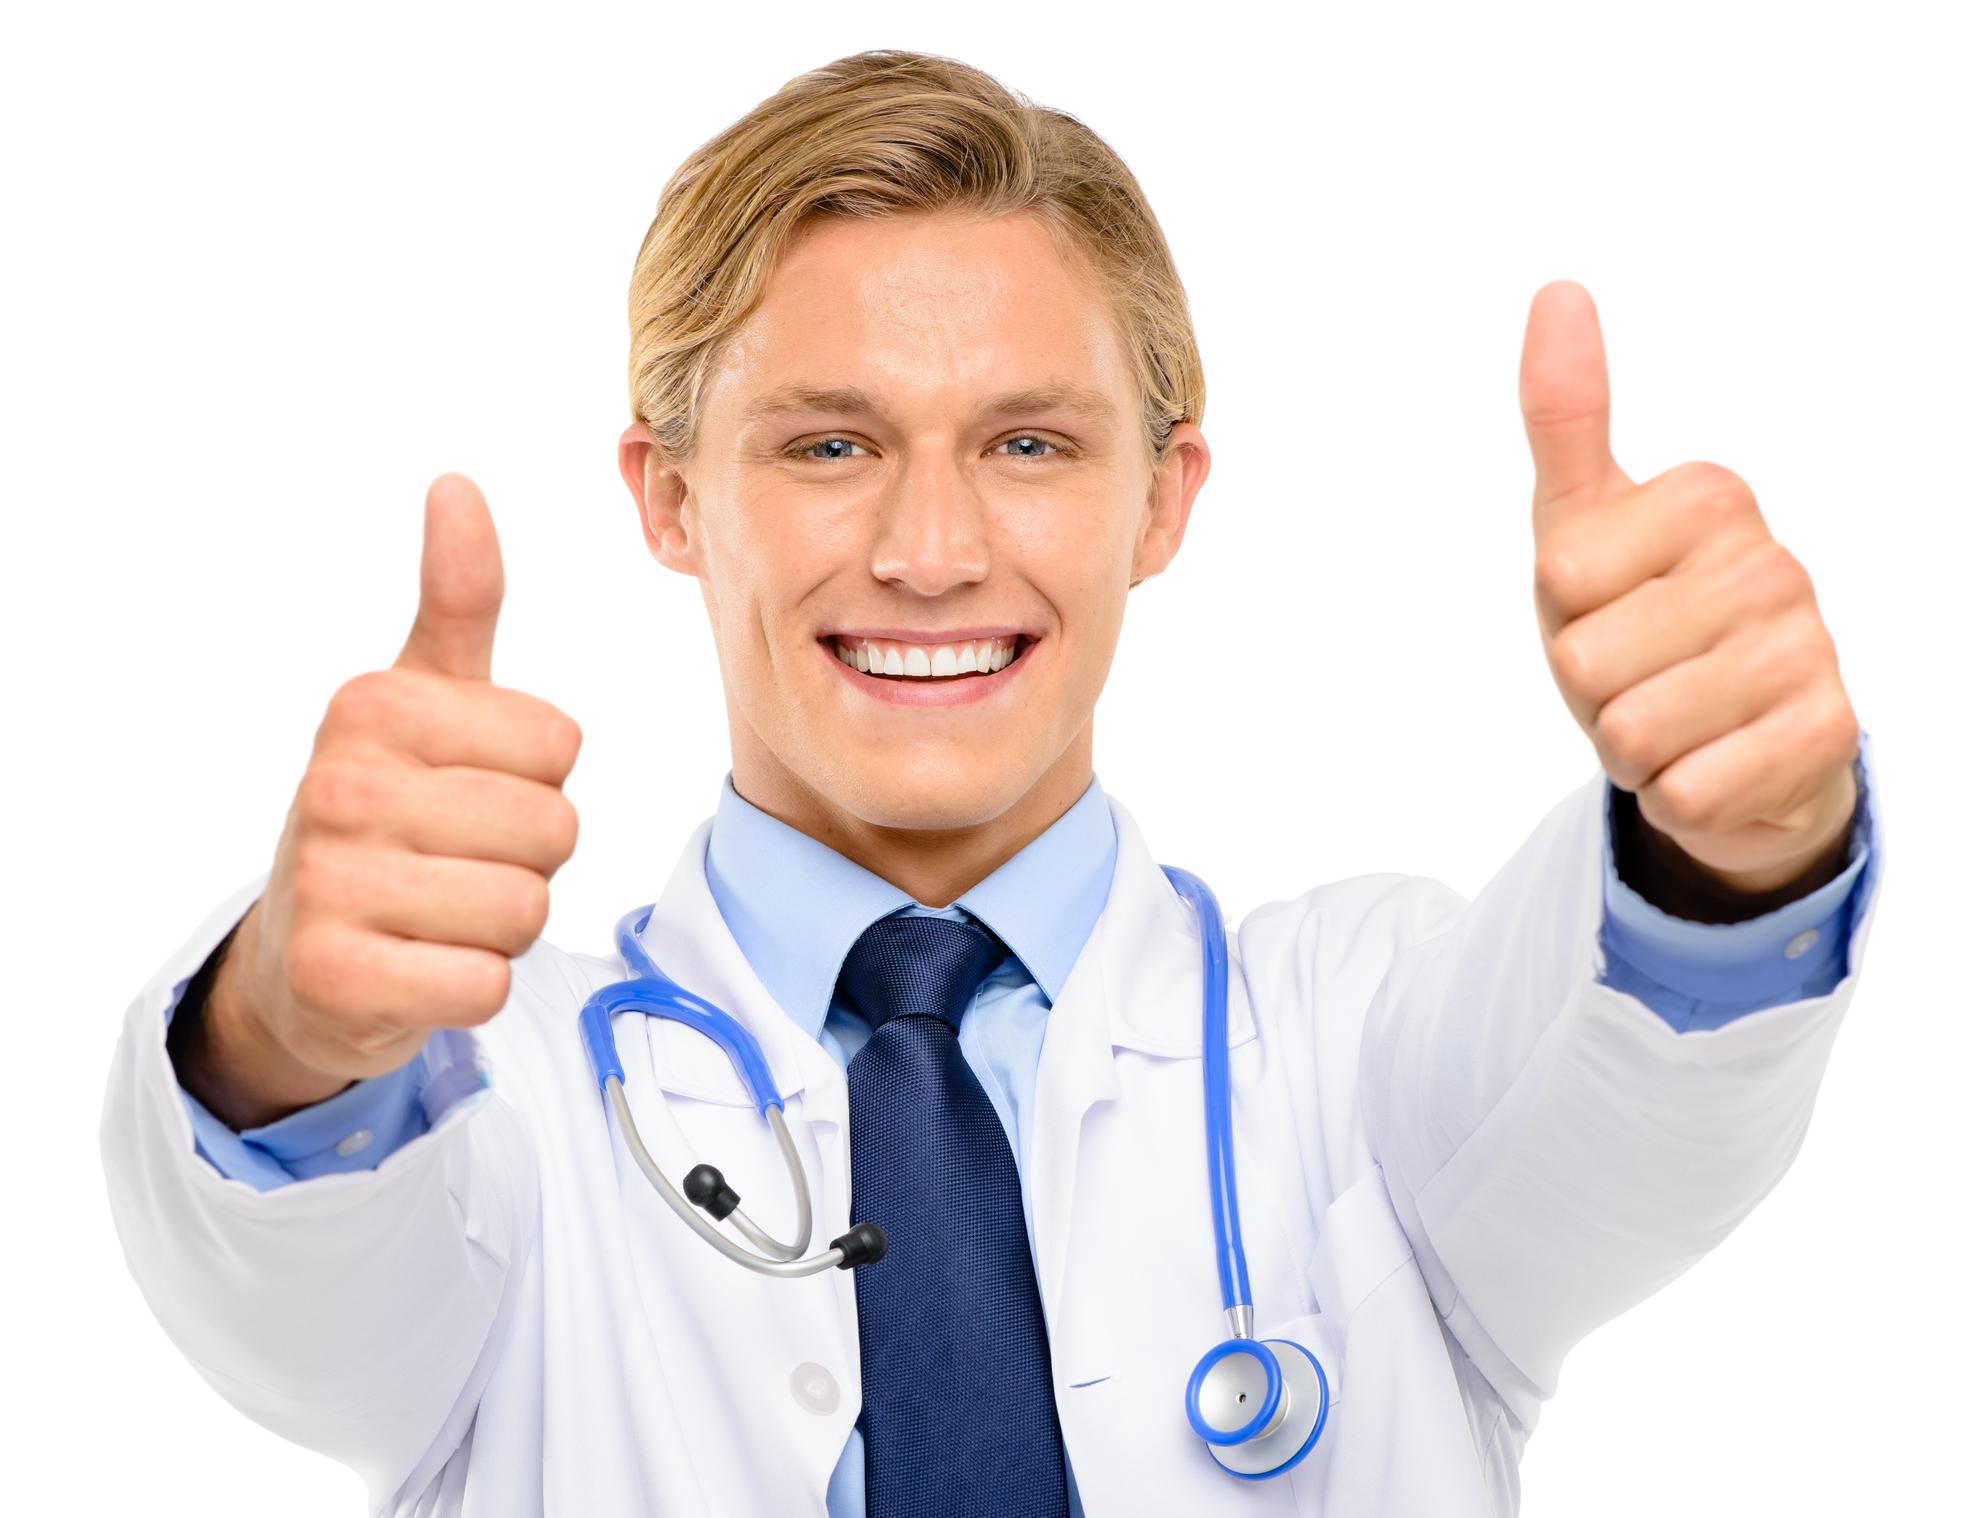 Why Array Biopharma Deciphera Pharmaceuticals And